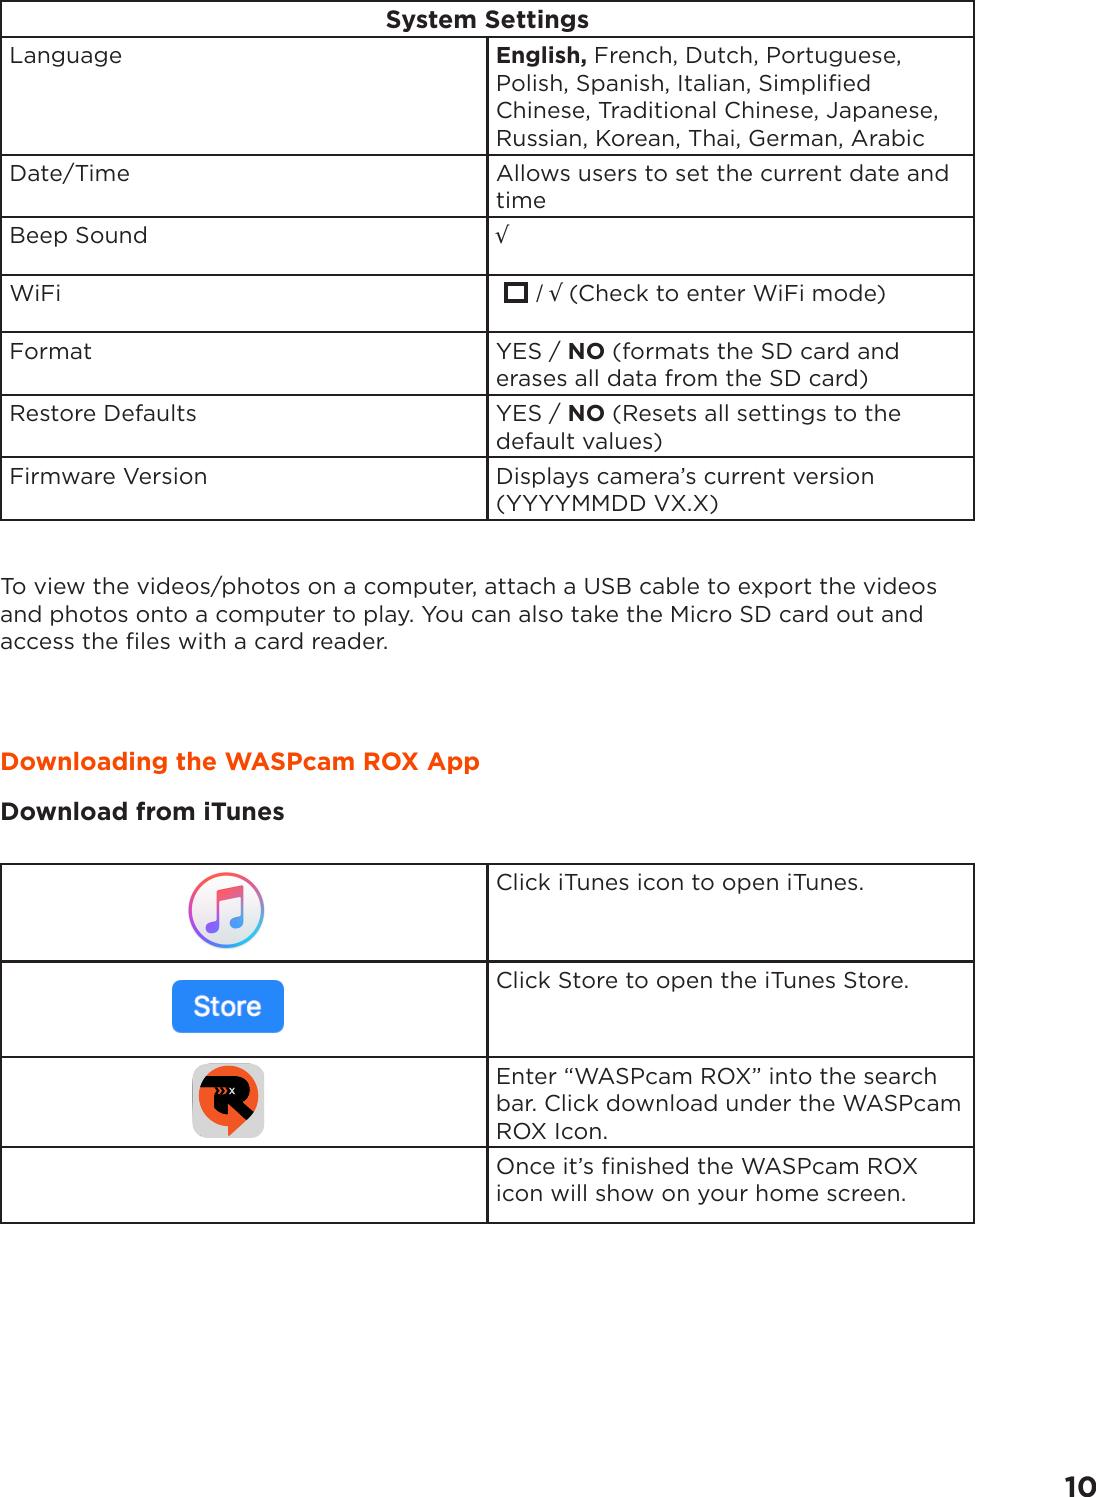 Cobra WASPcam ROX 9941 4k Operating Instructions EN